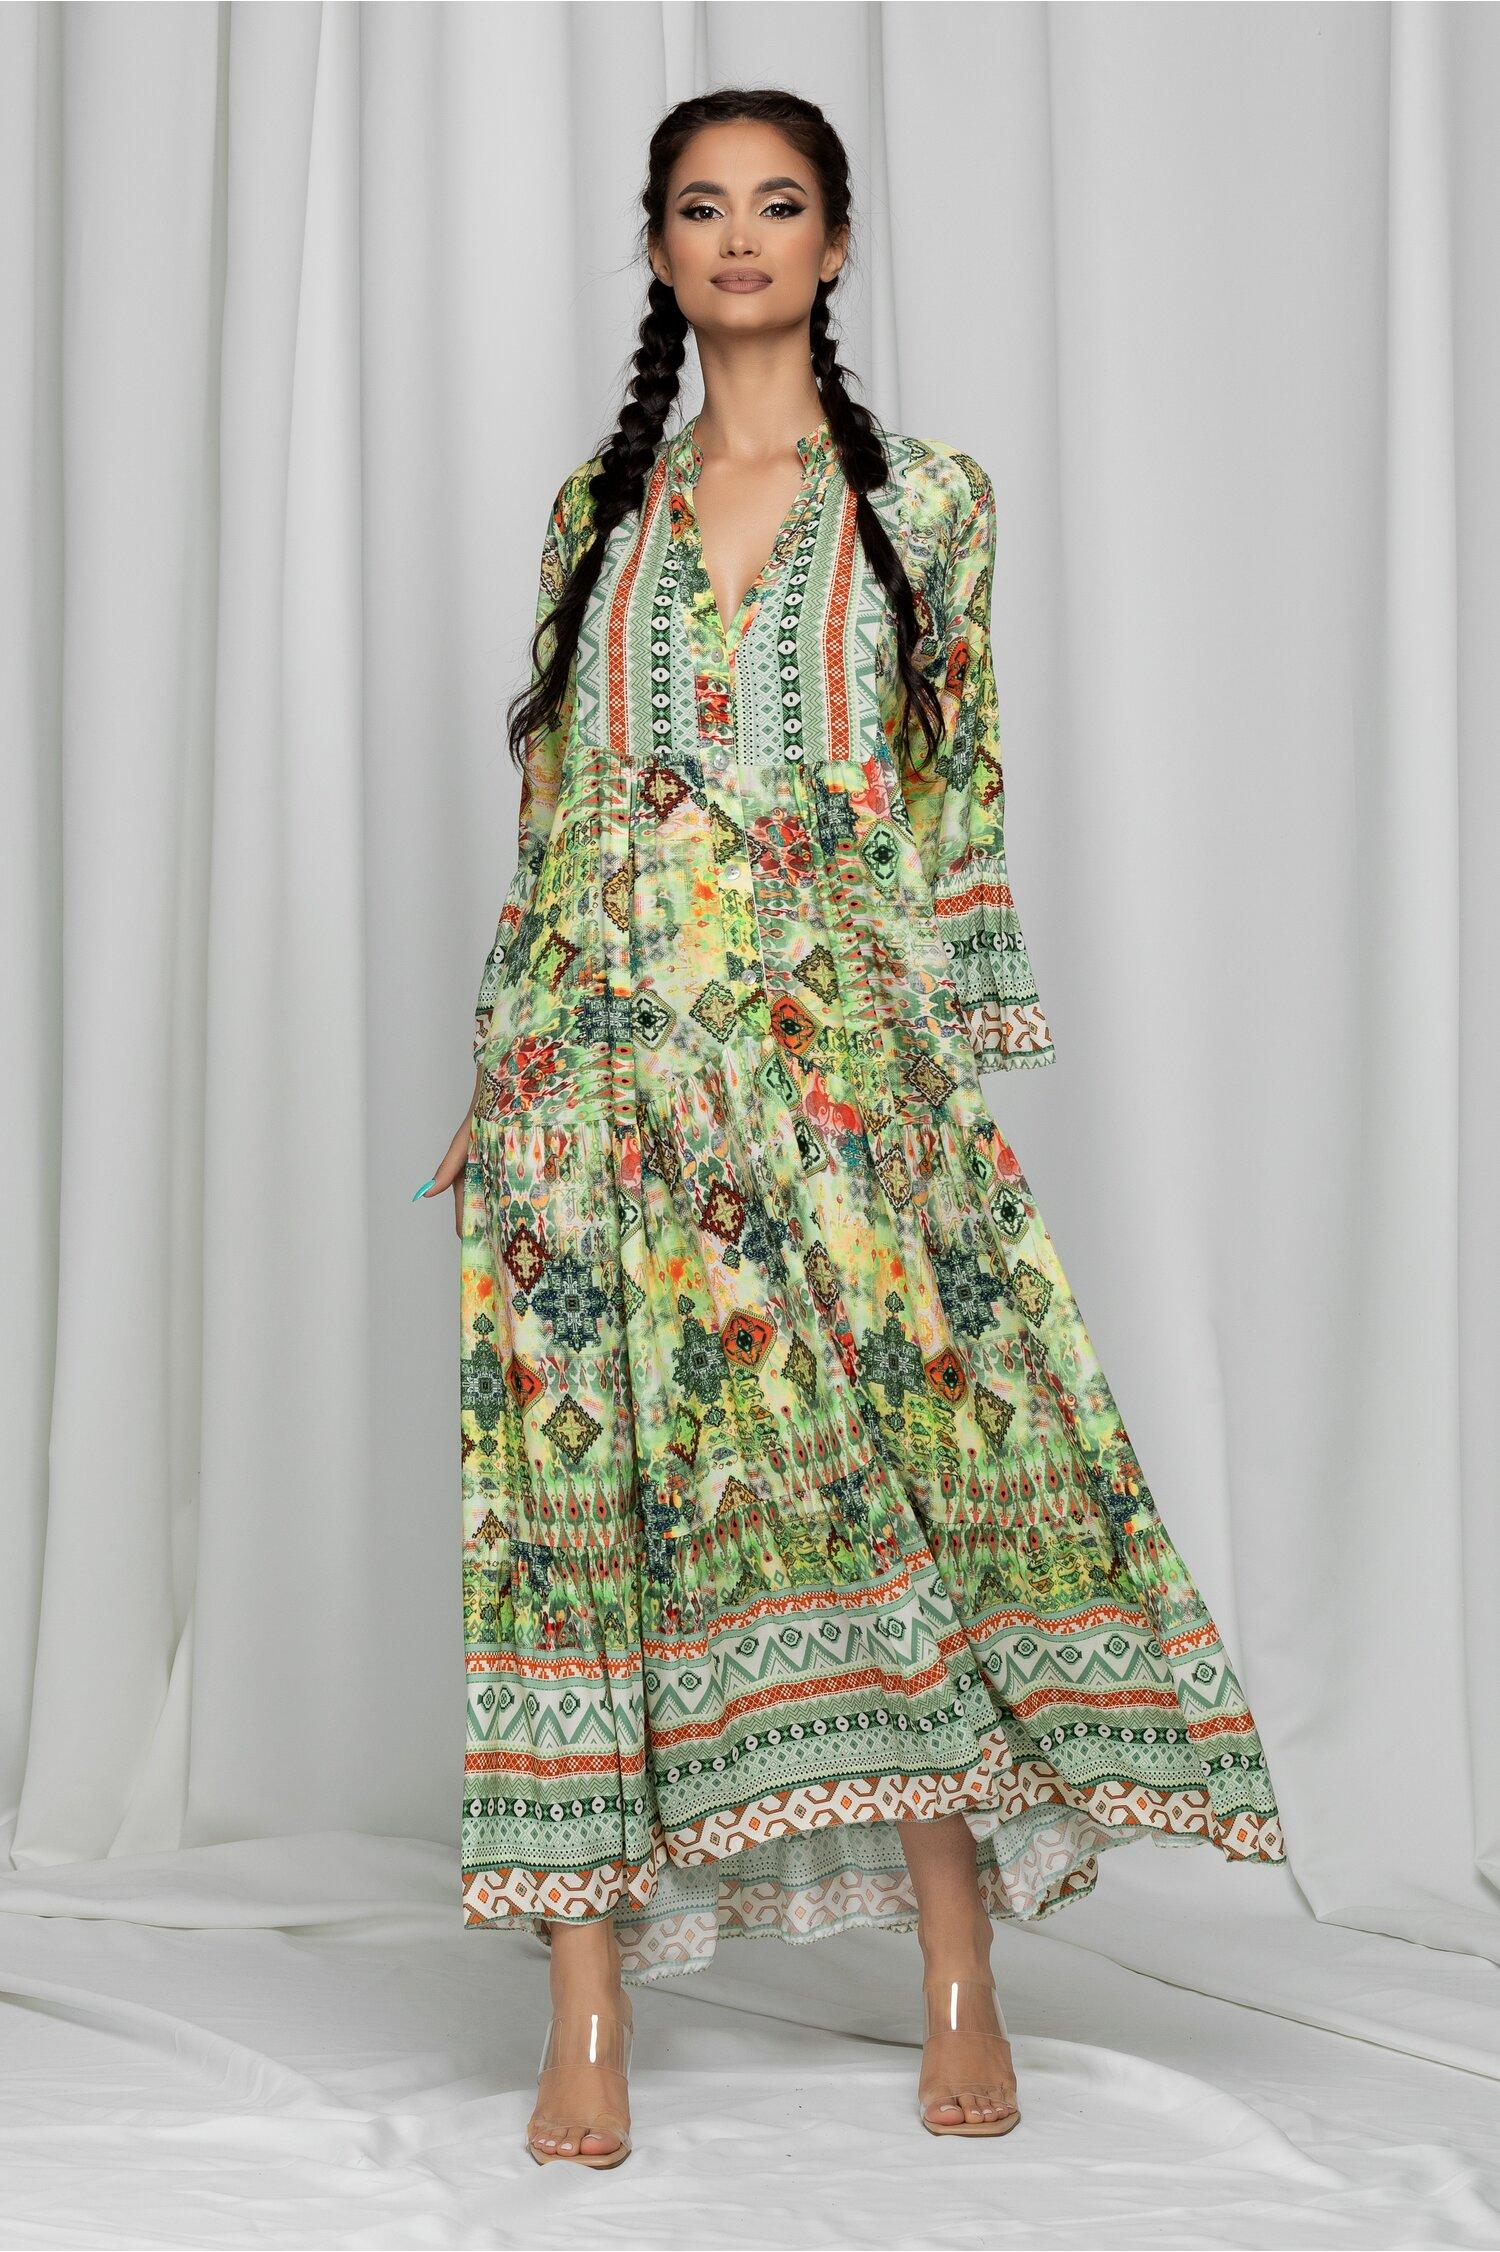 Rochie lunga Edna verde deschis cu imprimeuri diverse